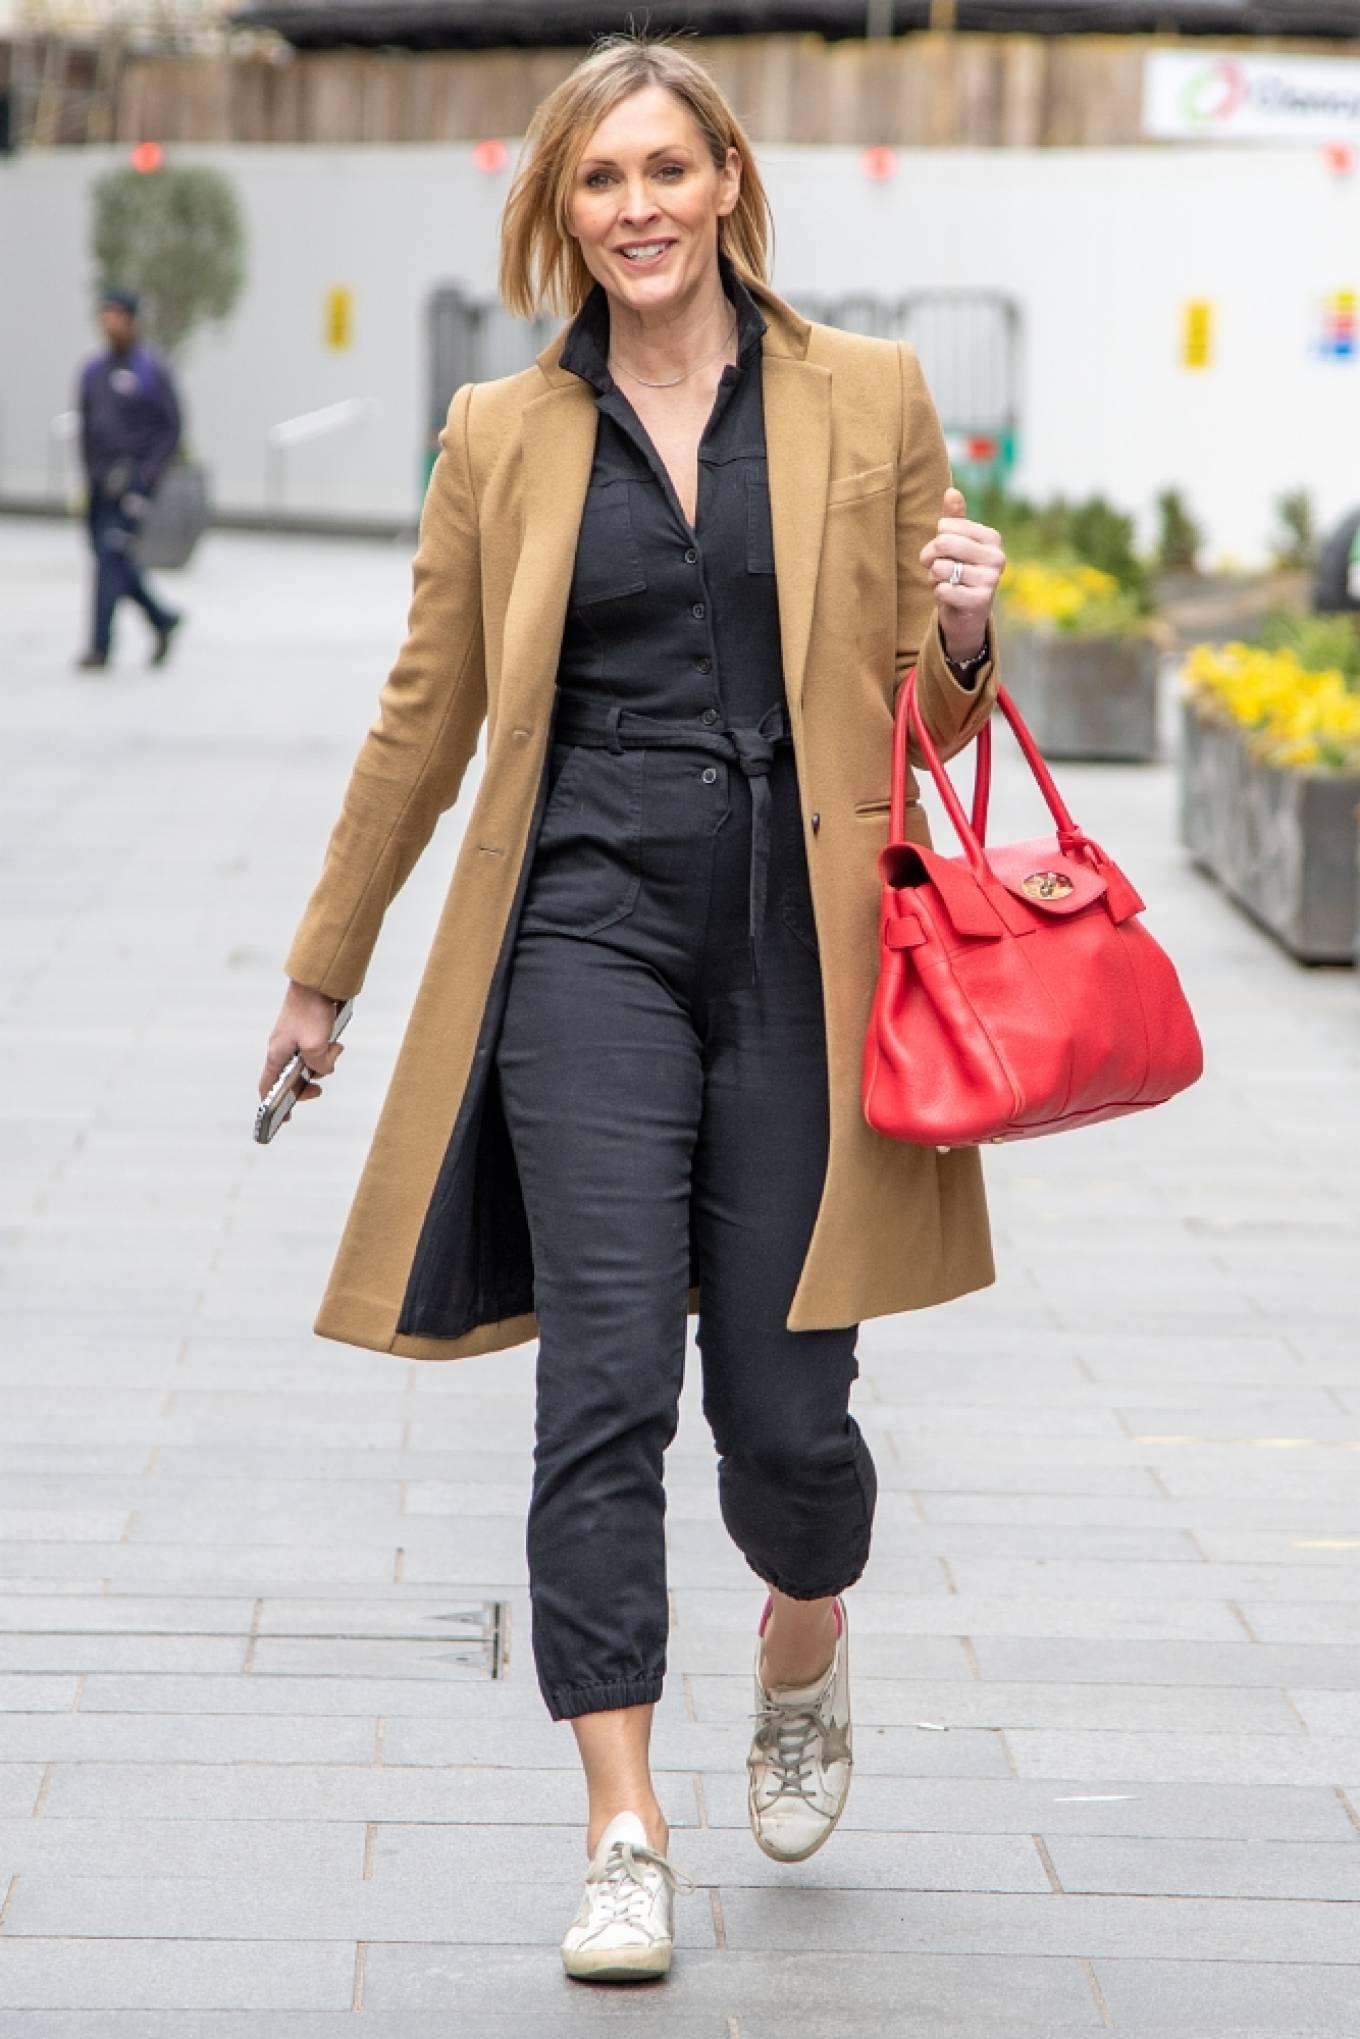 Jenni Falconer 2021 : Jenni Falconer – Seen after radio show in London-05